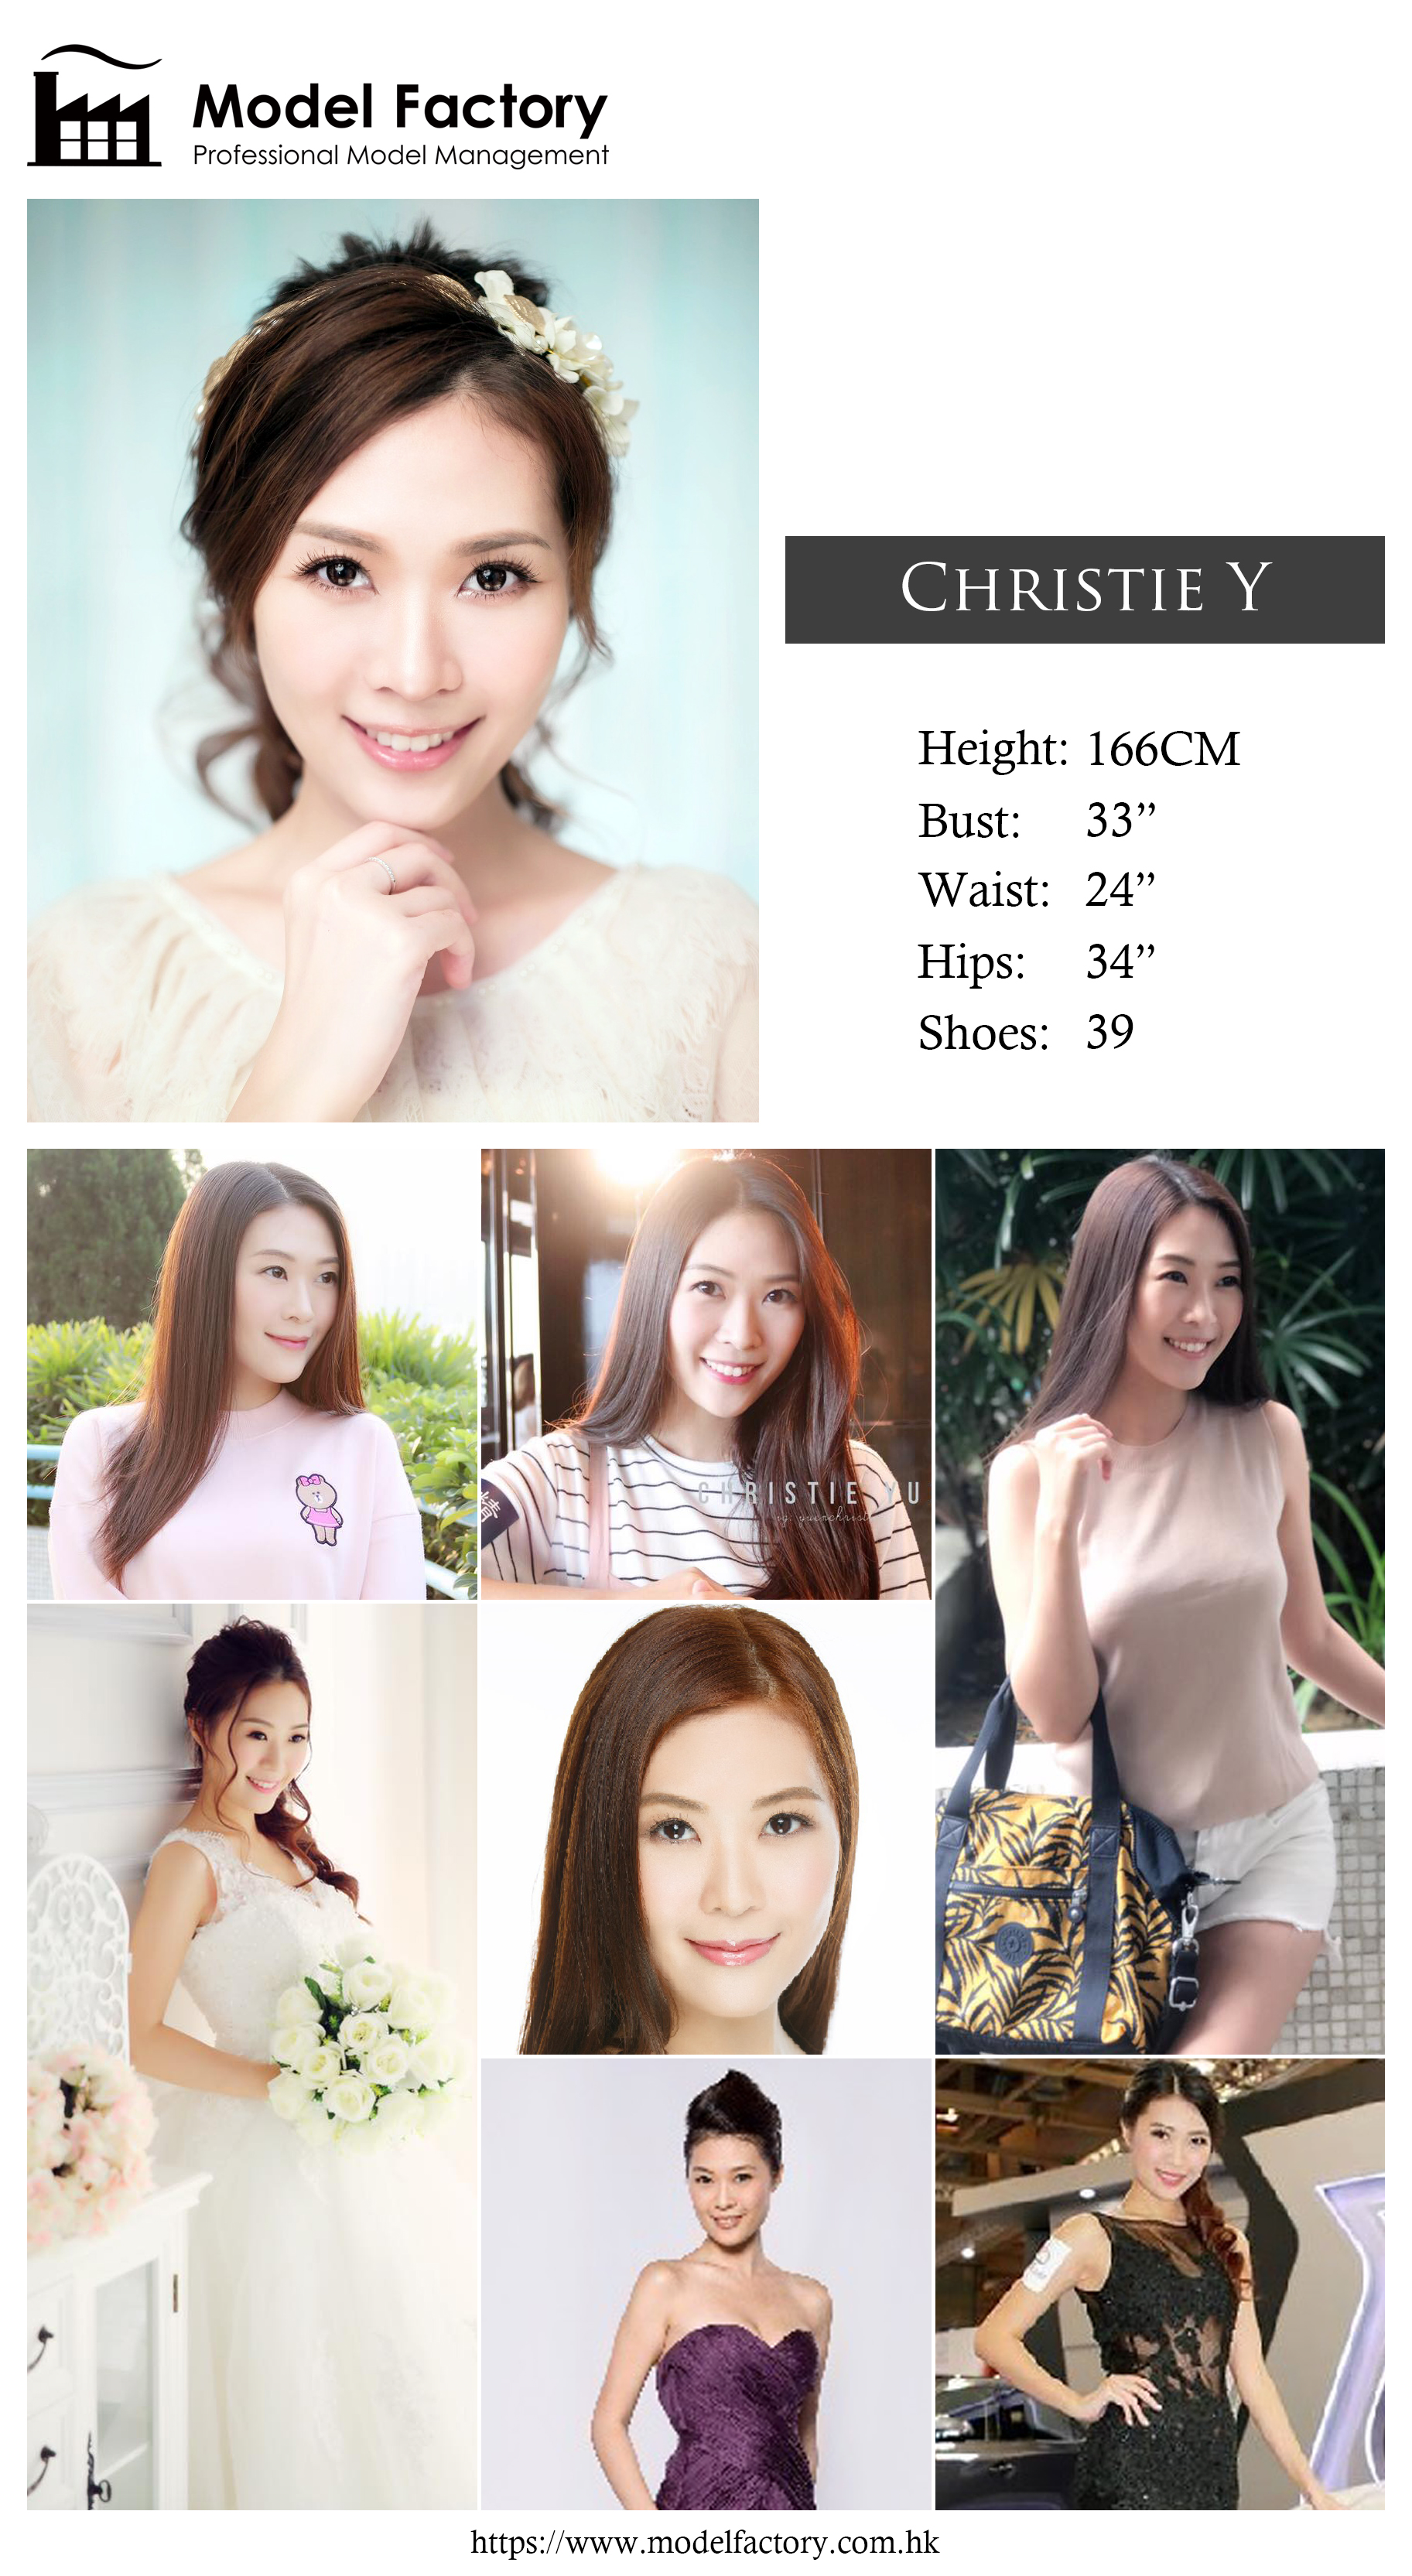 Model Factory Hong Kong Female Model ChristieY